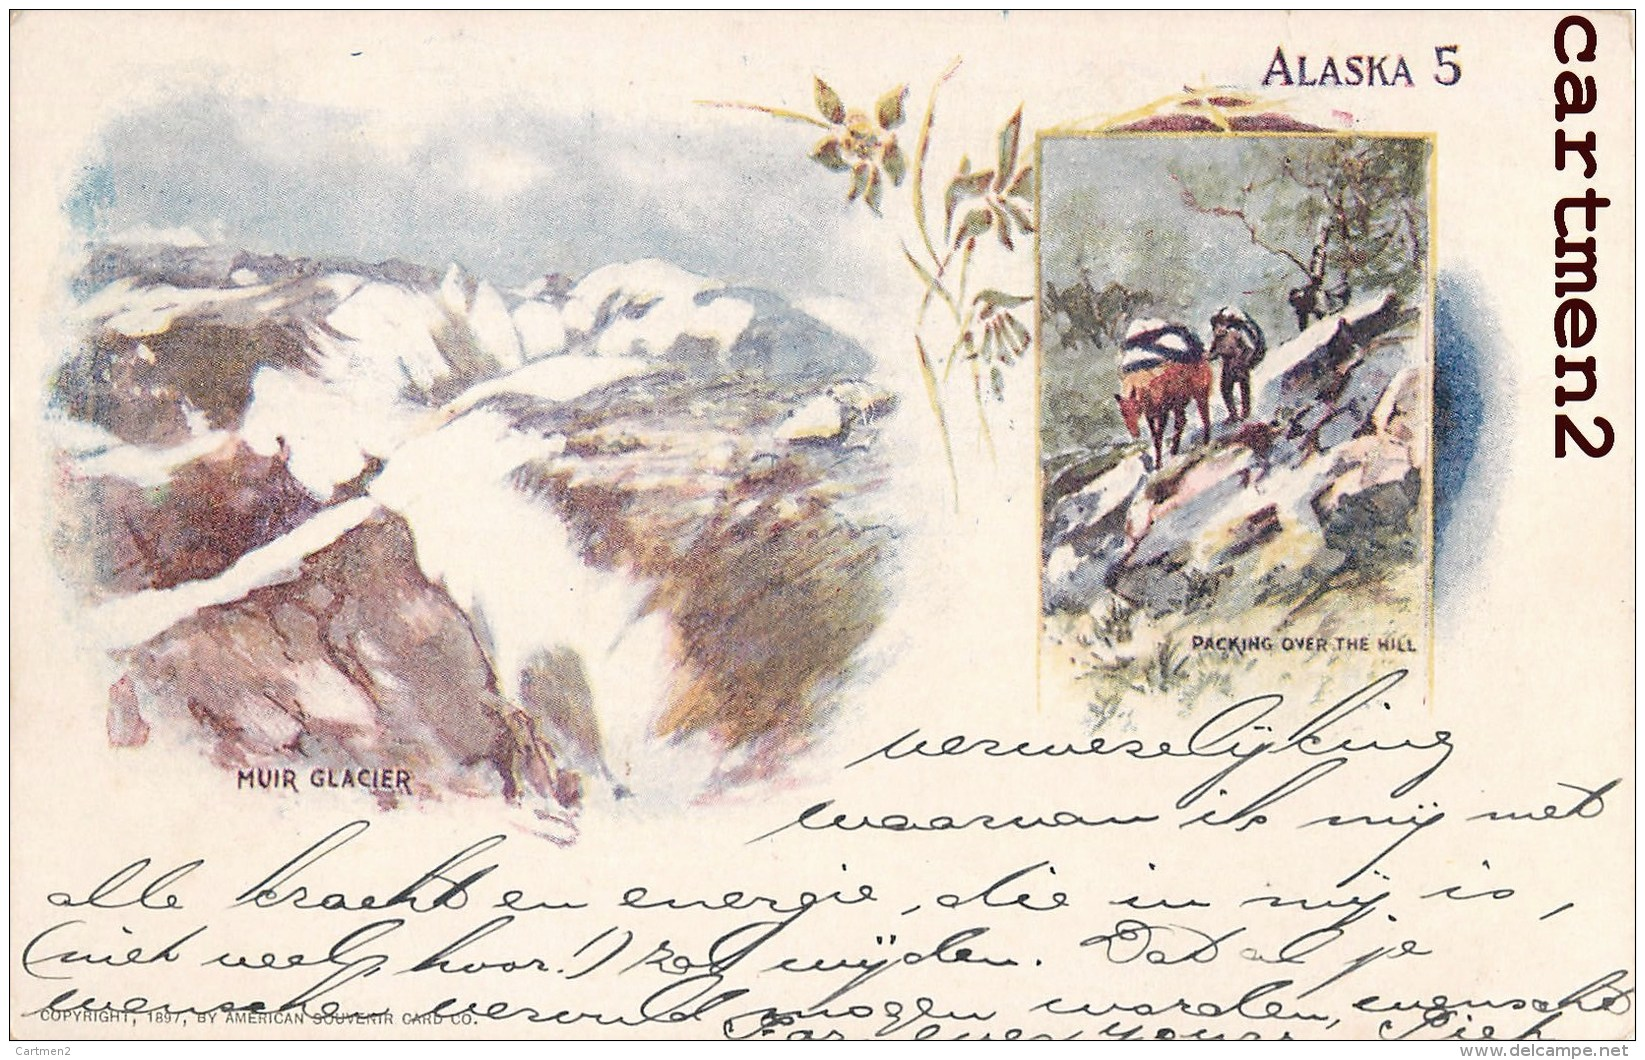 ALASKA GLACIER PACKING 1900 UNITED-STATES - United States